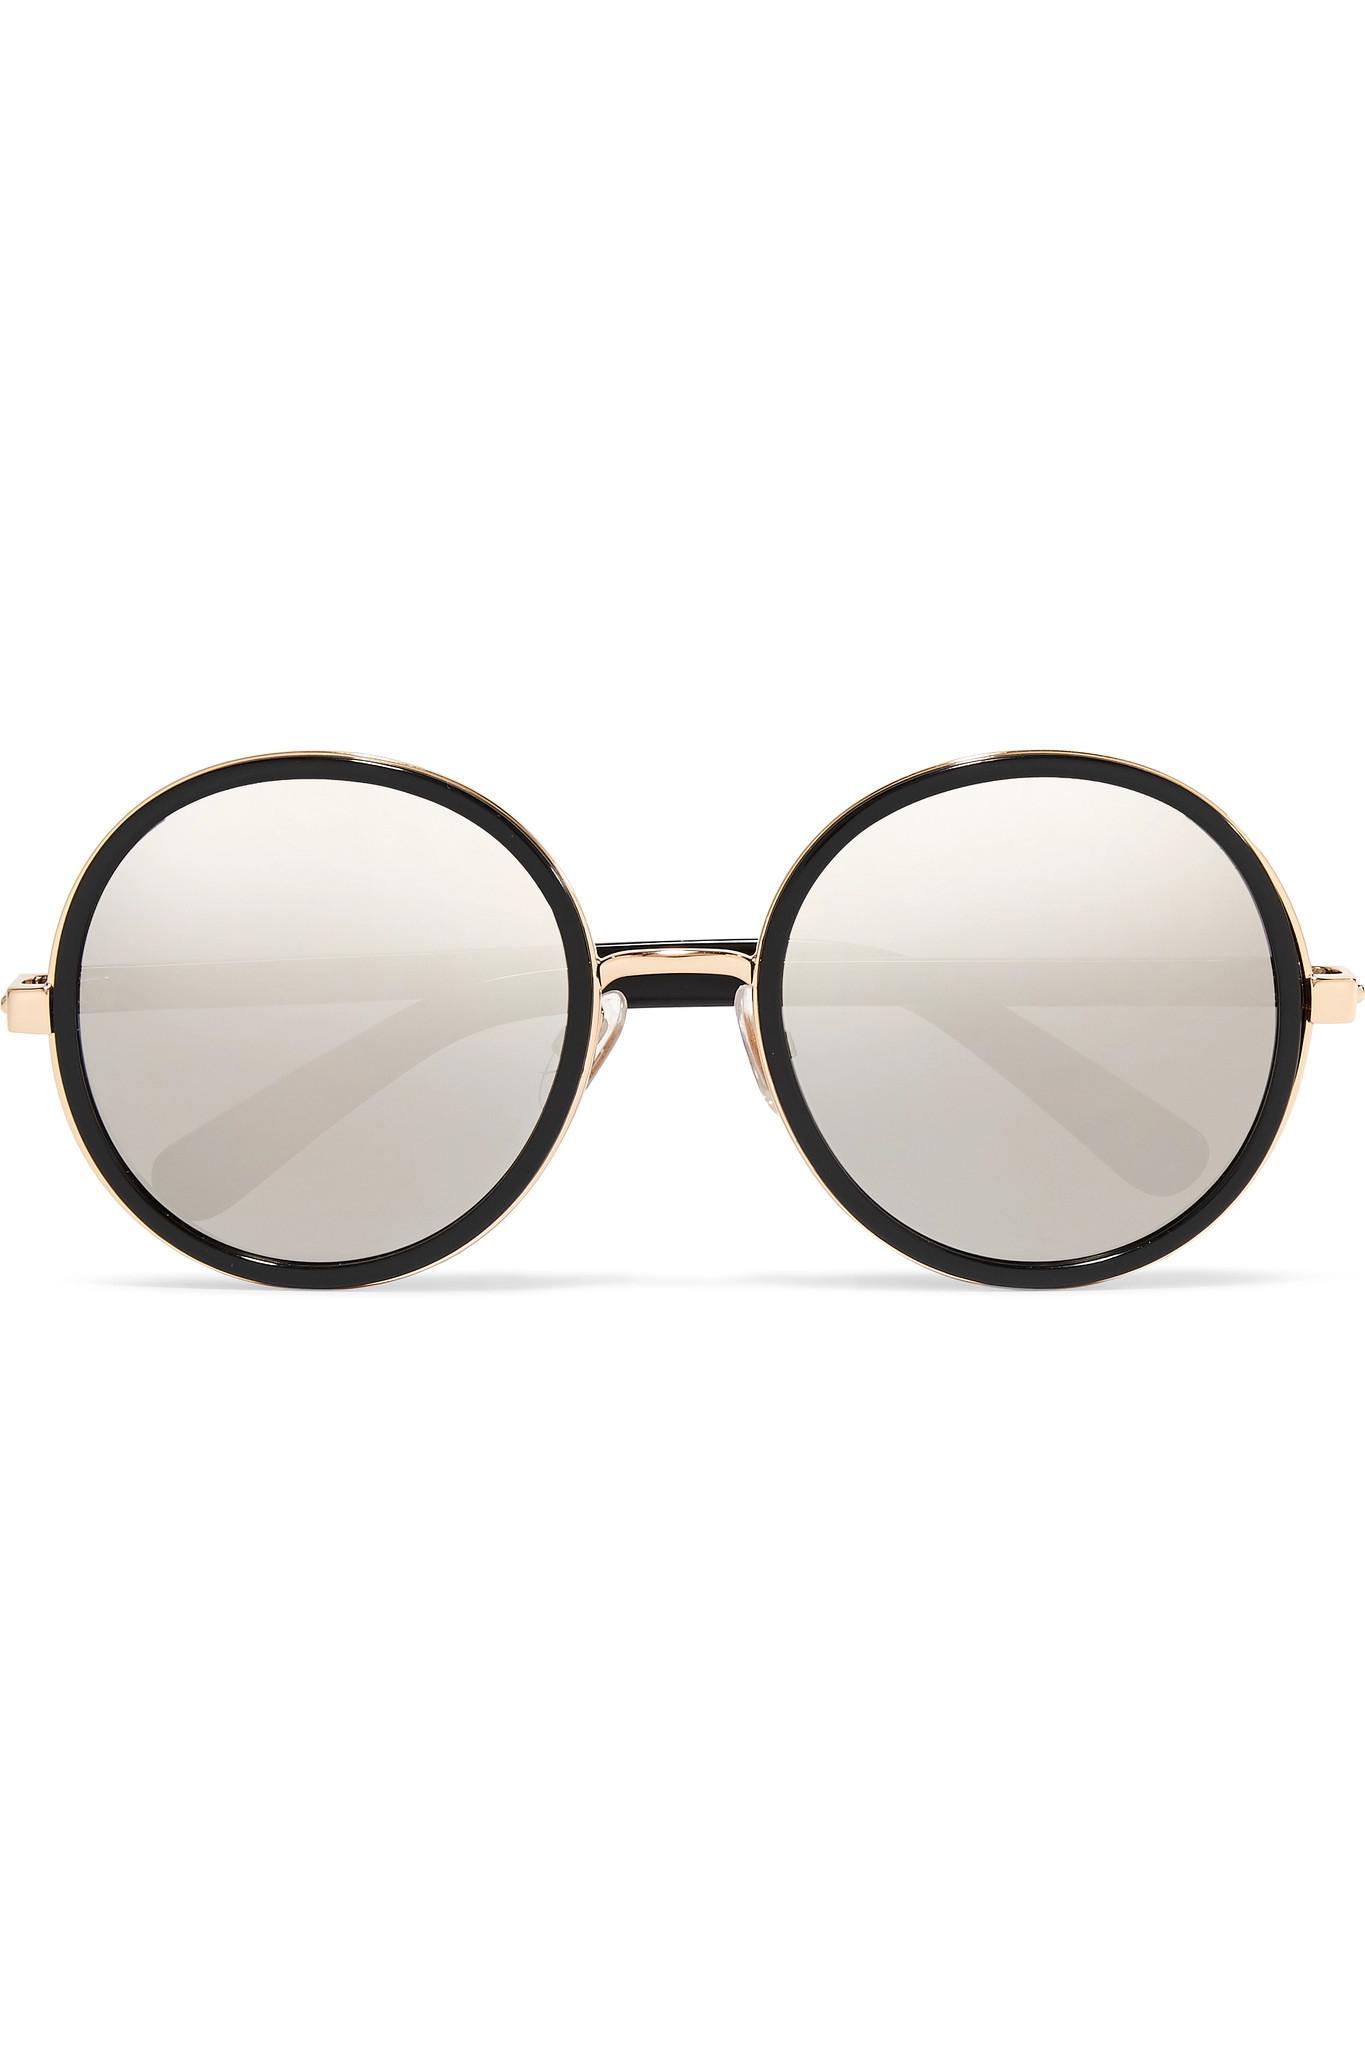 c005859ca9d Jimmy Choo. Women s Black Andie Round-frame Glittered Acetate Mirrored  Sunglasses